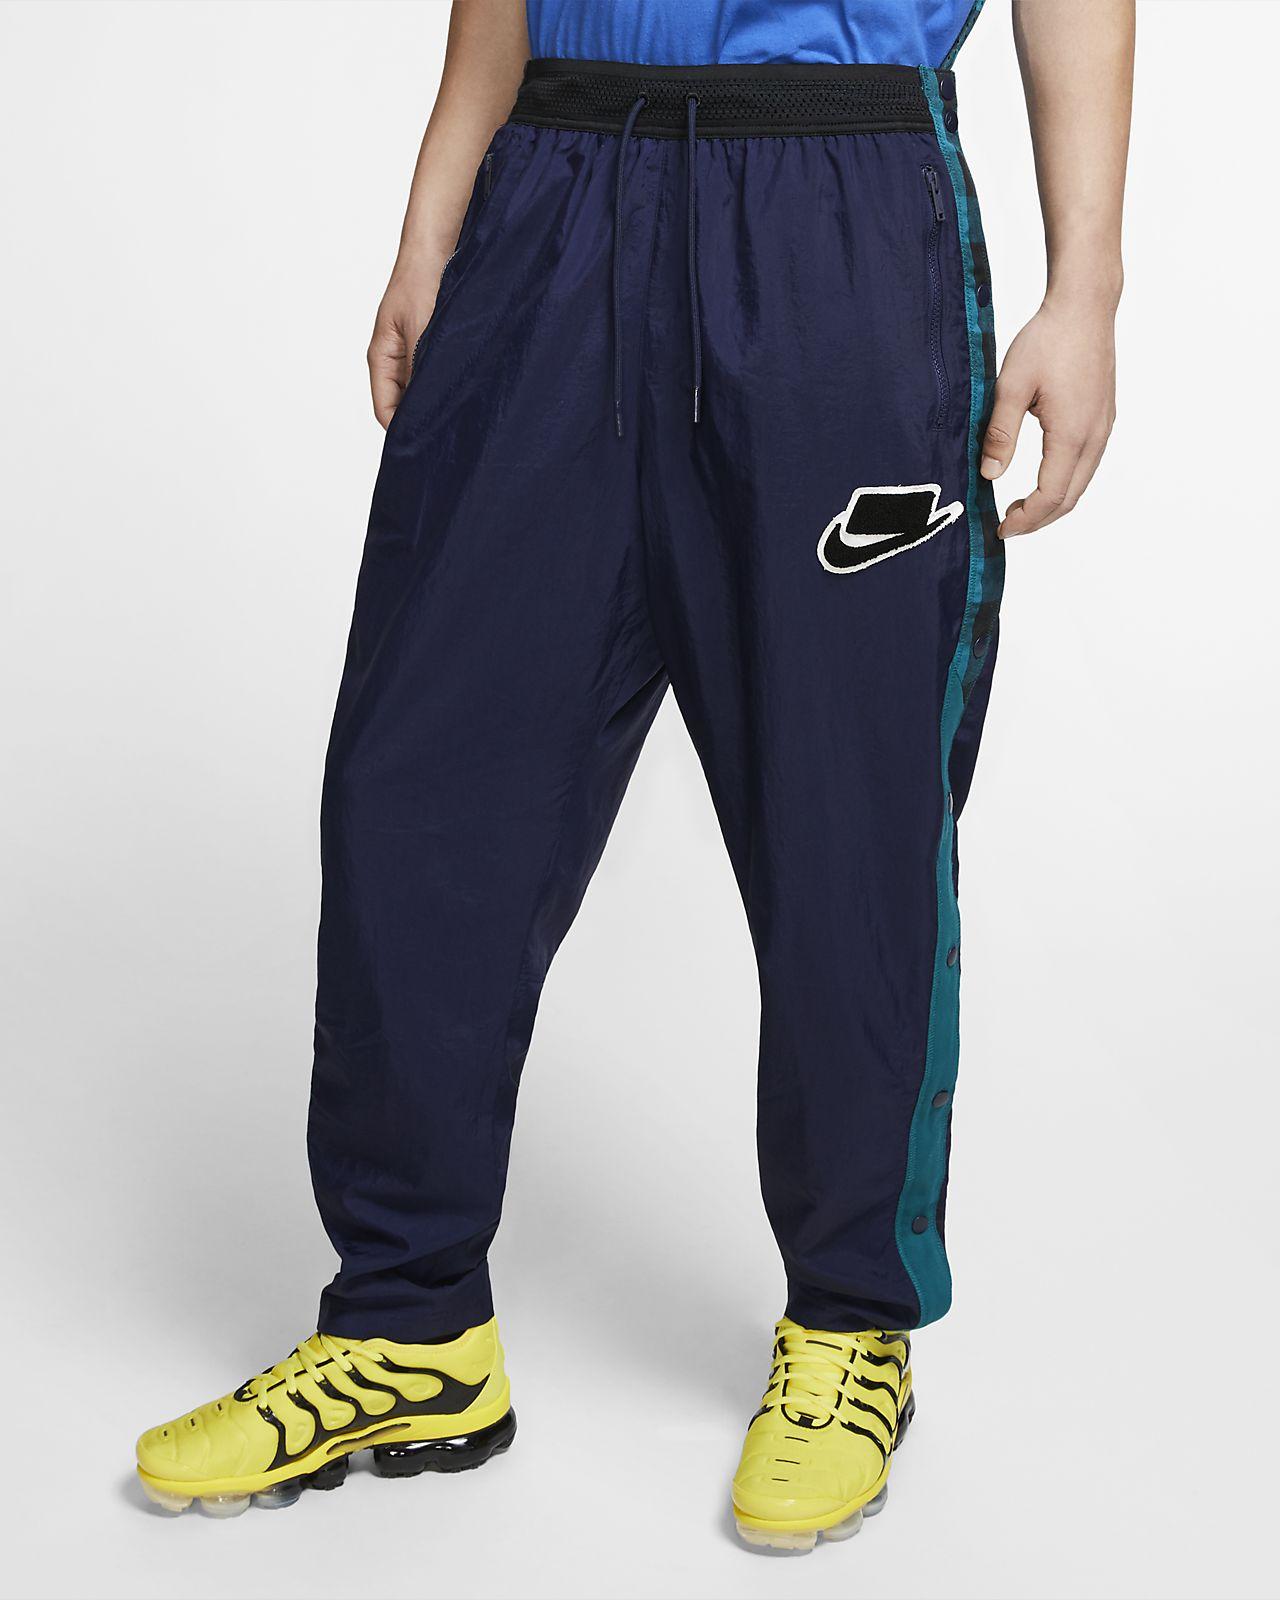 Nike Sportswear NSW 男款梭織運動褲